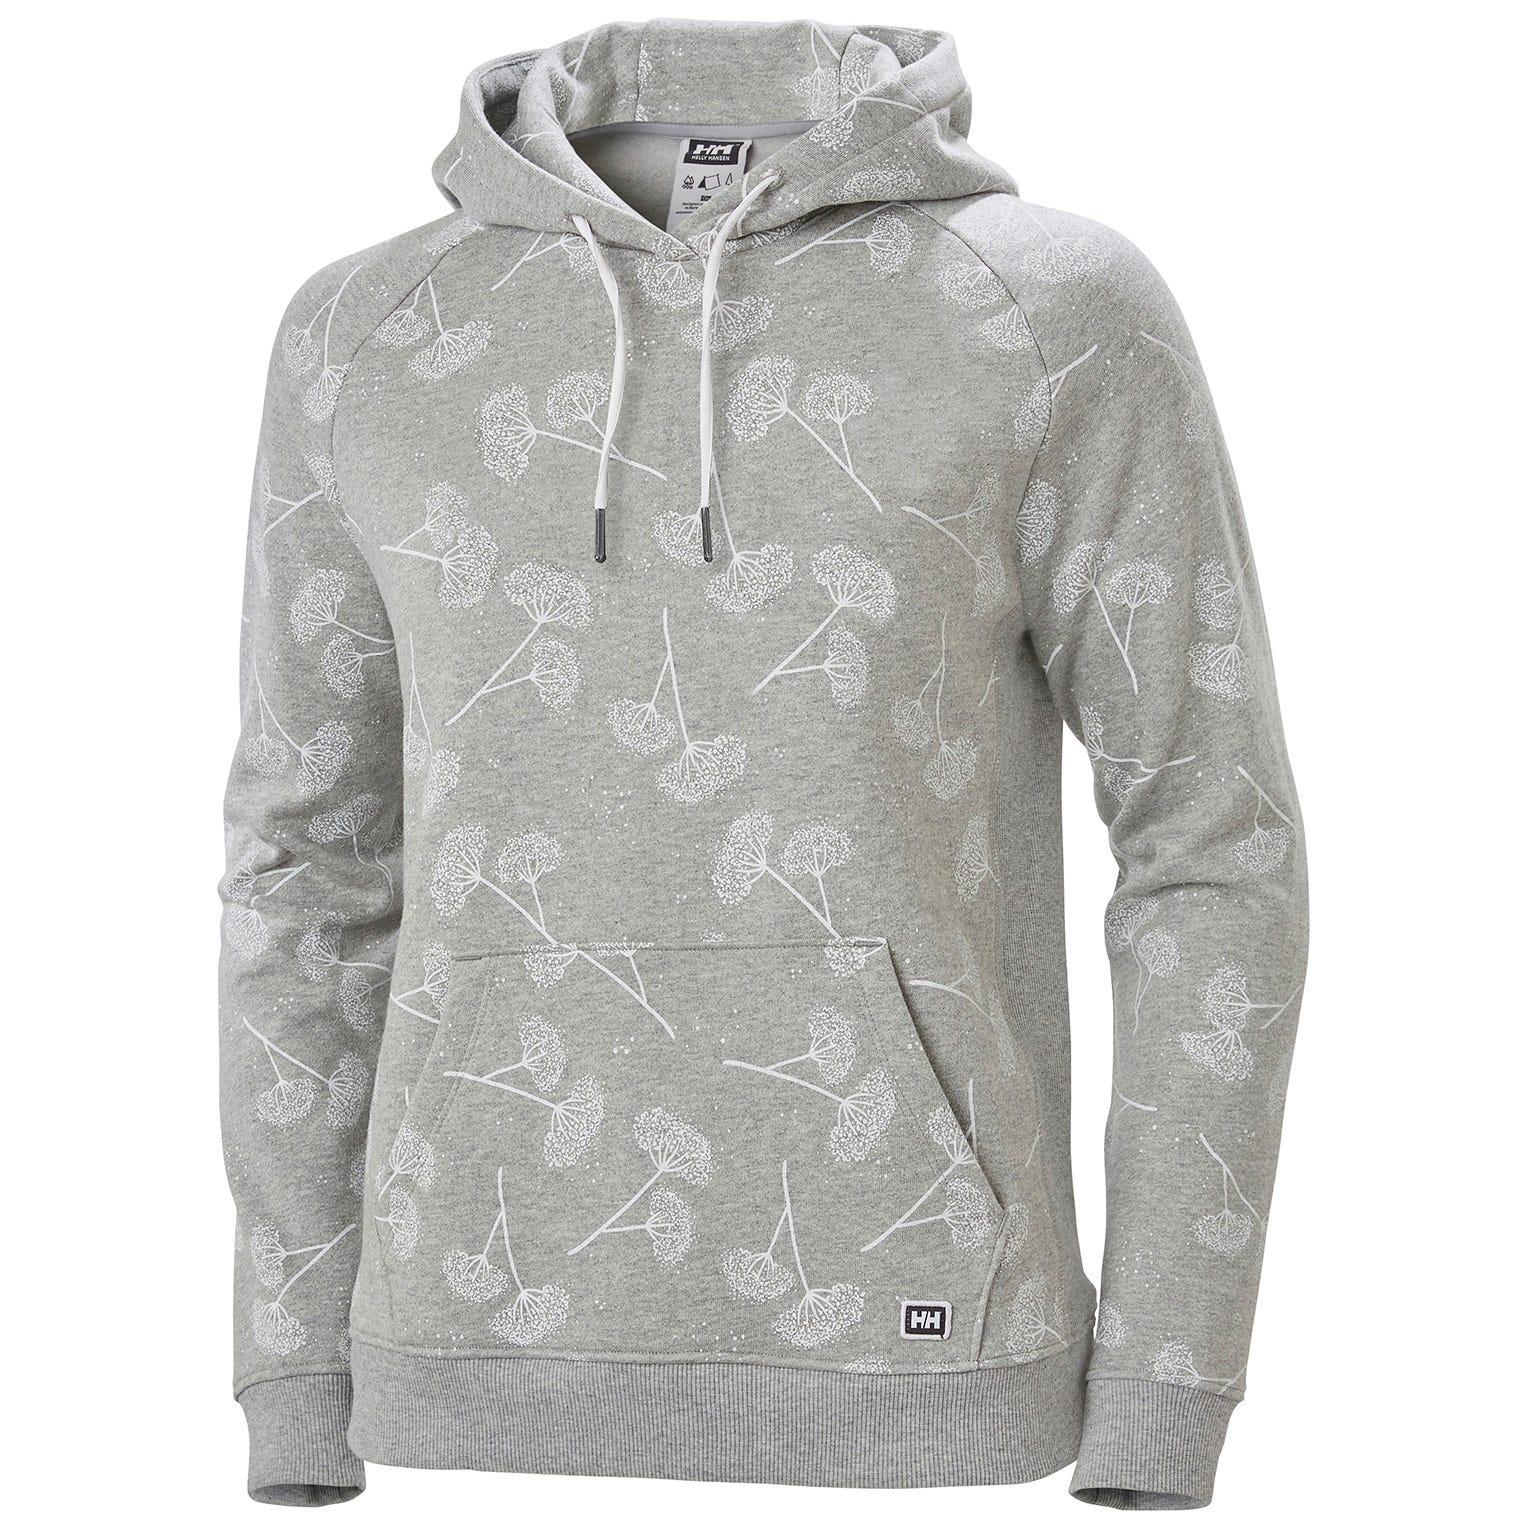 HV Polo Hoody Barbados navy Sweater mit Kapuze XS-XL Kollektion 2020 H/&H Celle